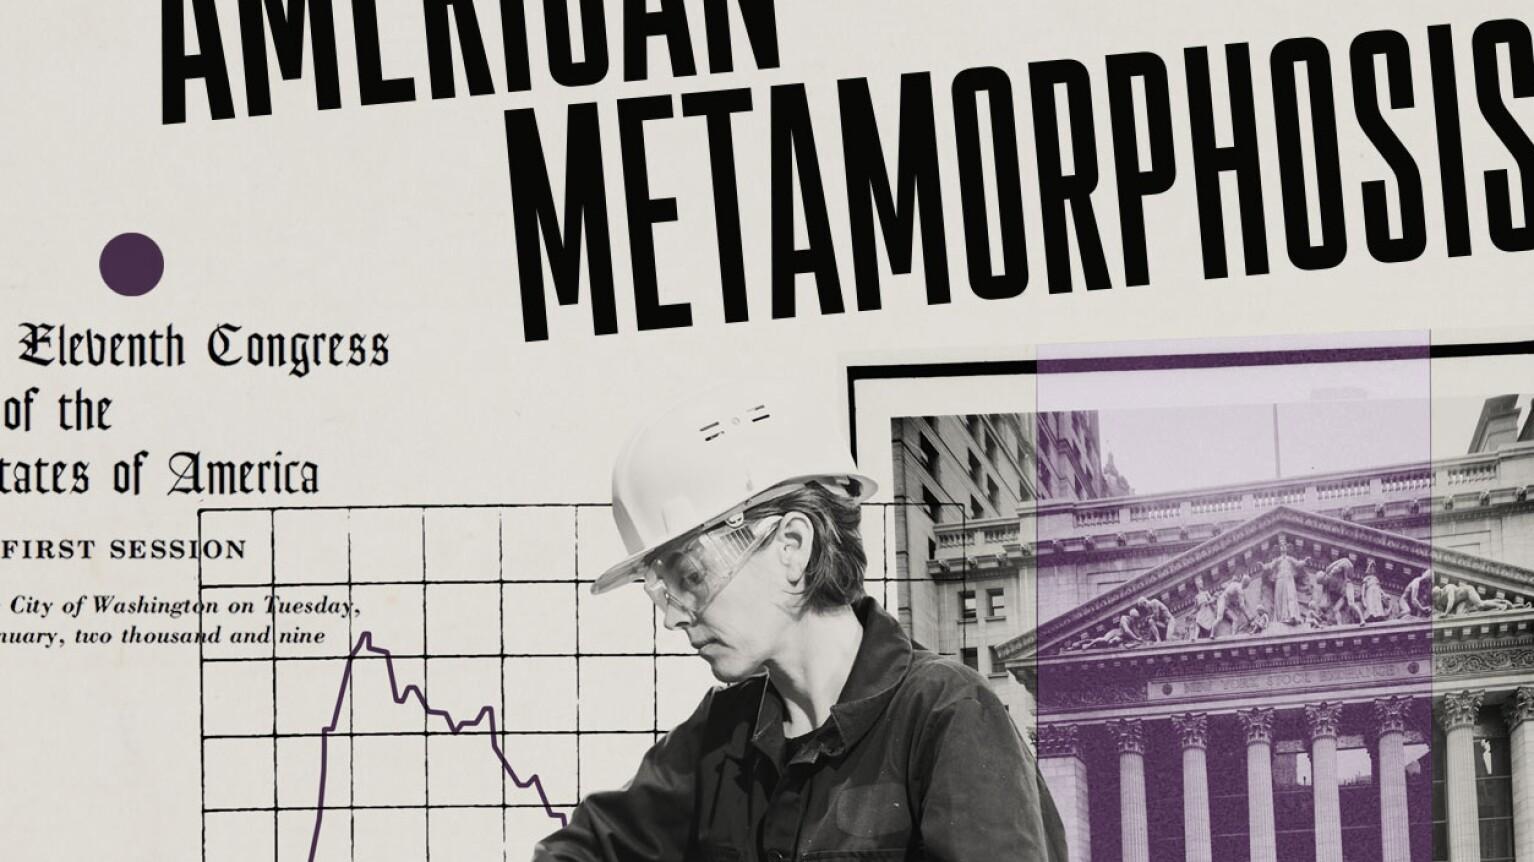 American Metamorphosis Episode 3